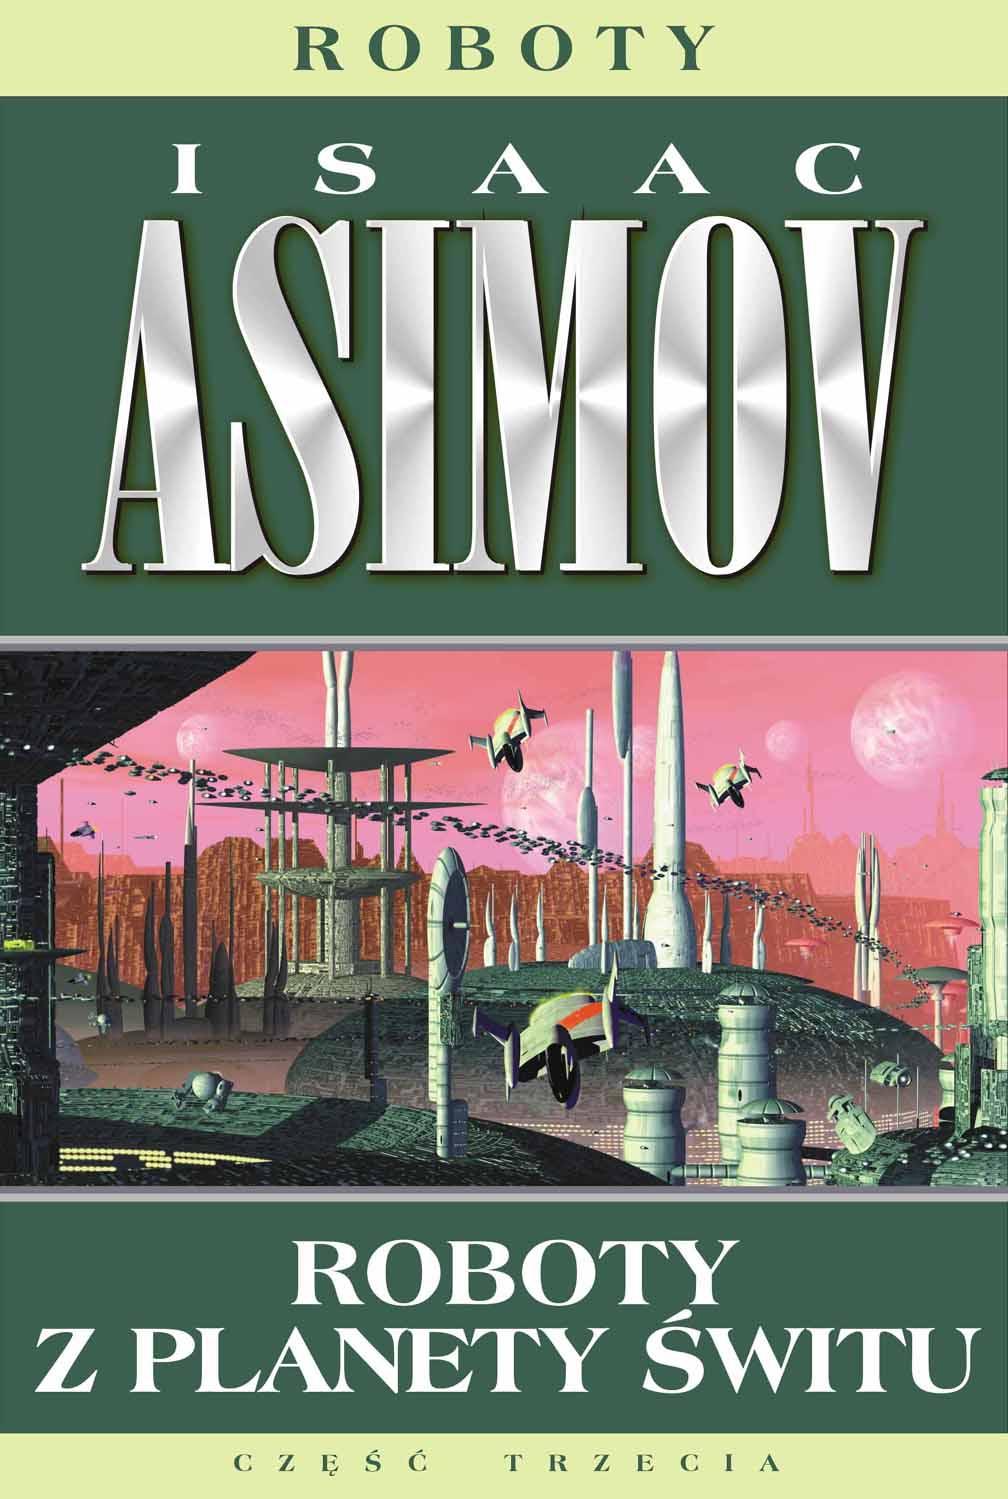 Roboty. Roboty z planety świtu - Isaac Asimov